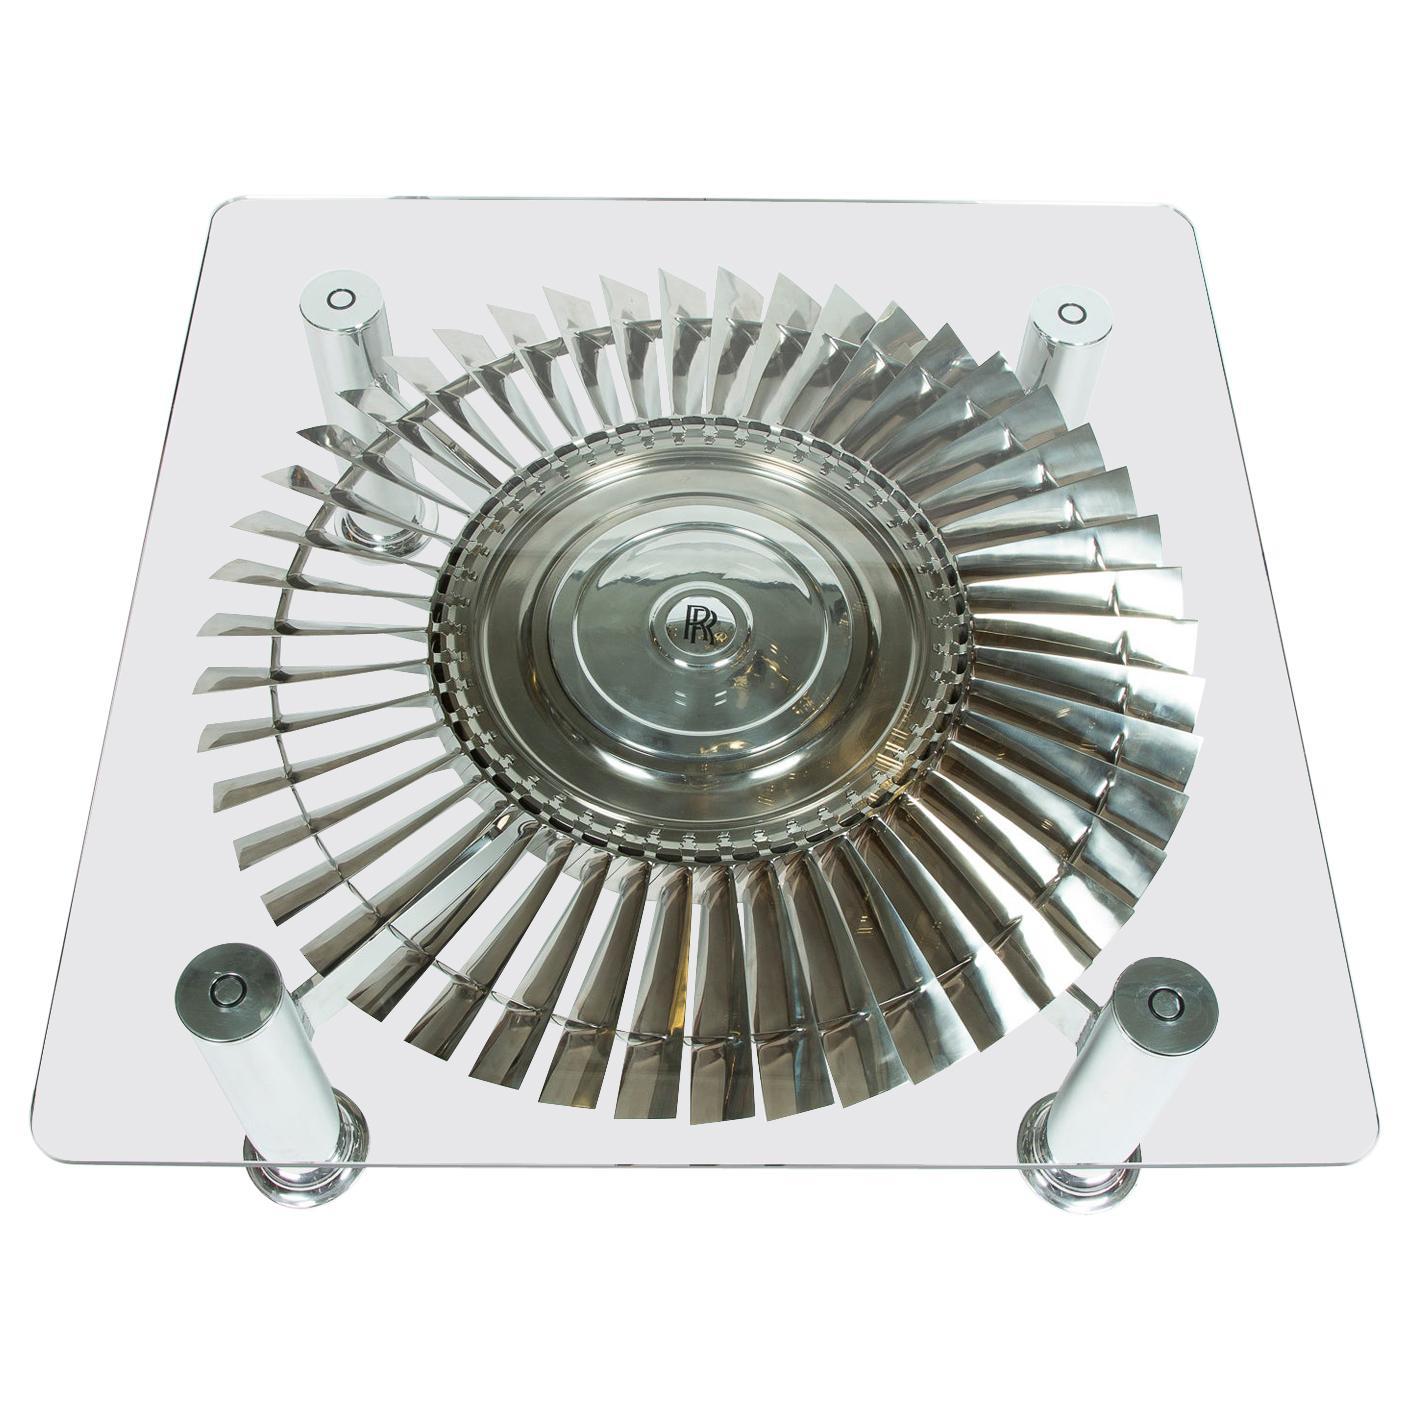 Rolls Royce Pegasus Titanium Turbine Table